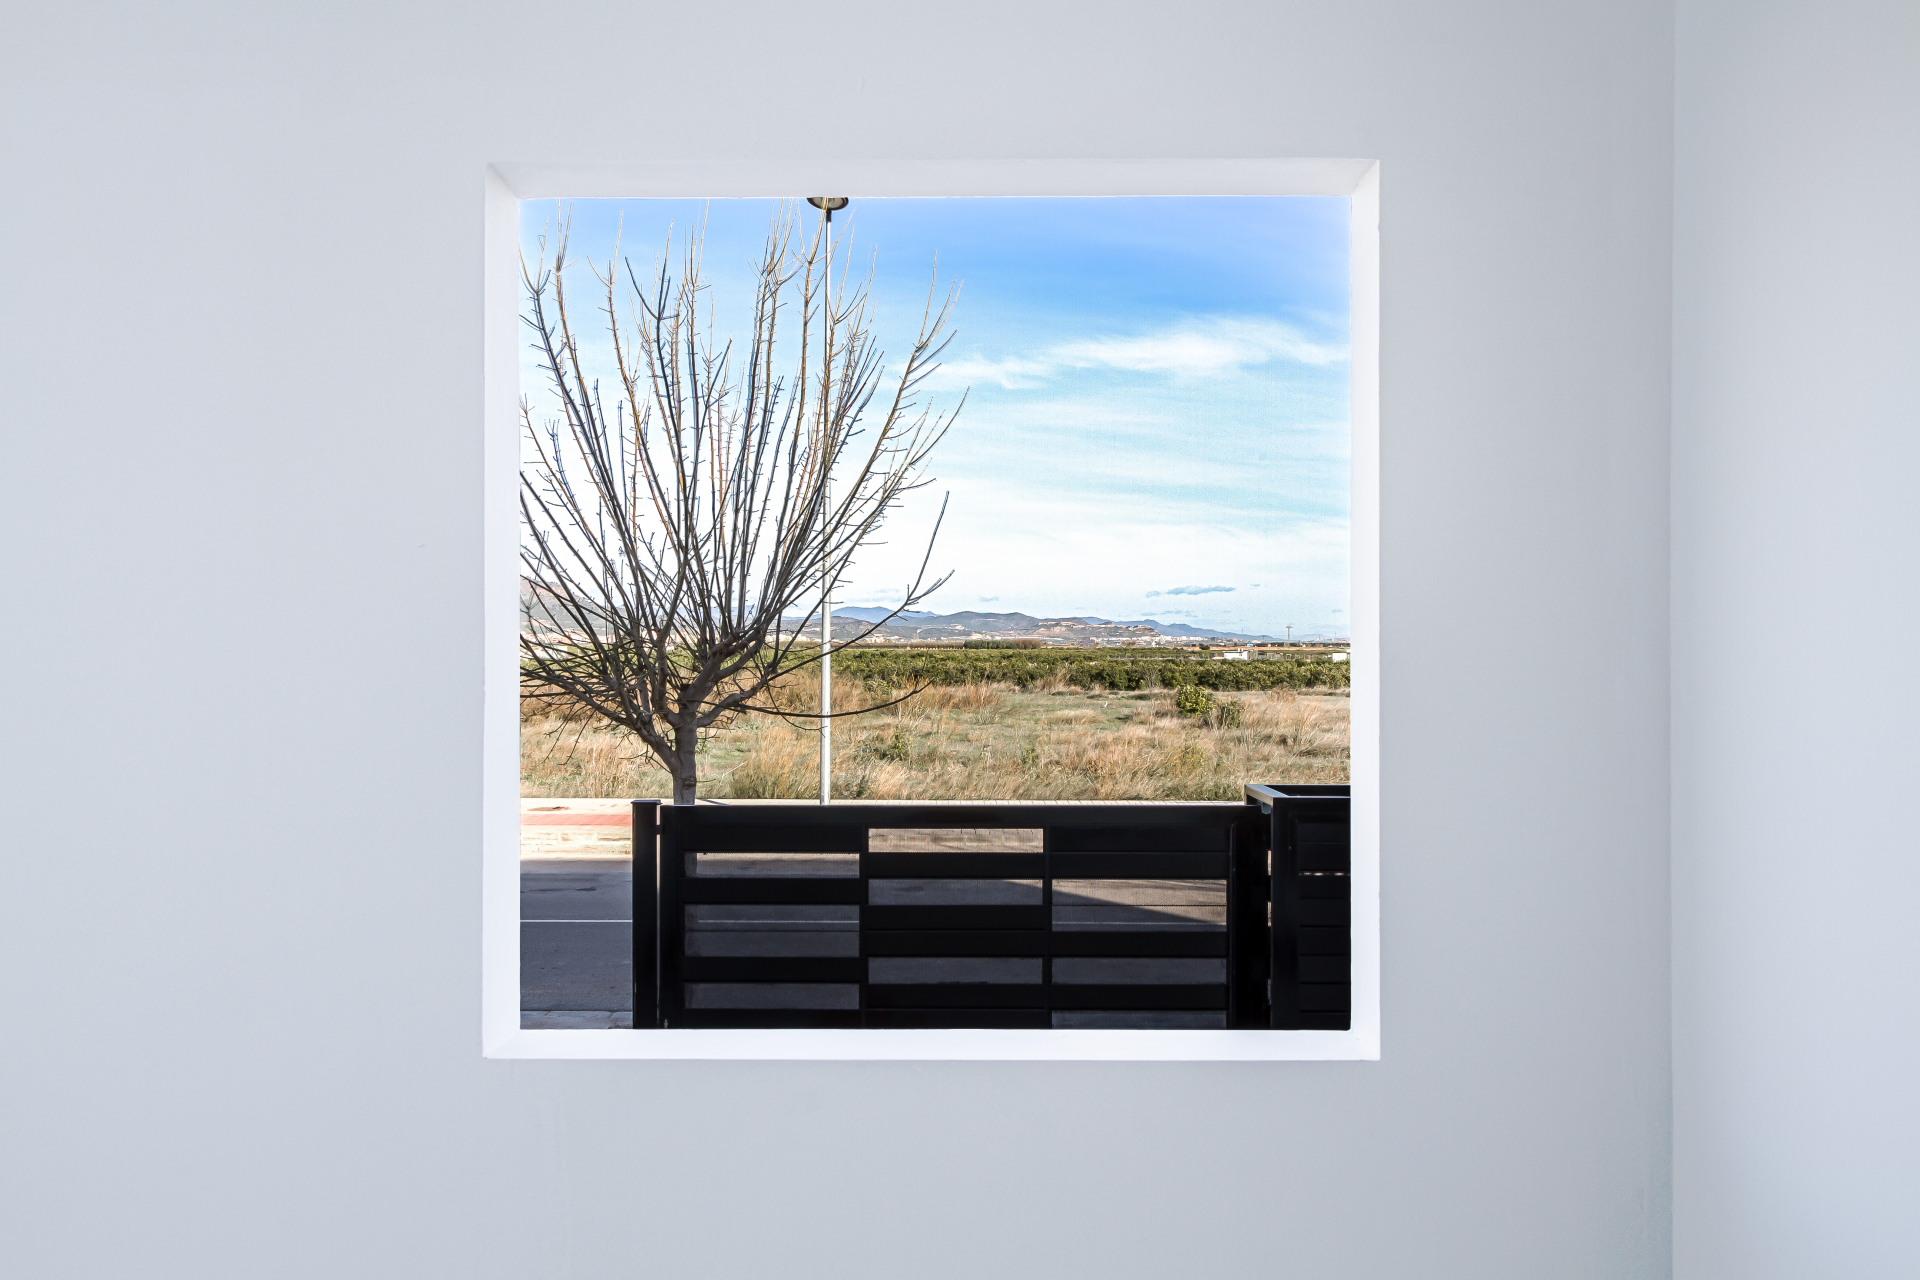 fotografia-arquitectura-valencia-german-cabo-viraje-v01 (10)